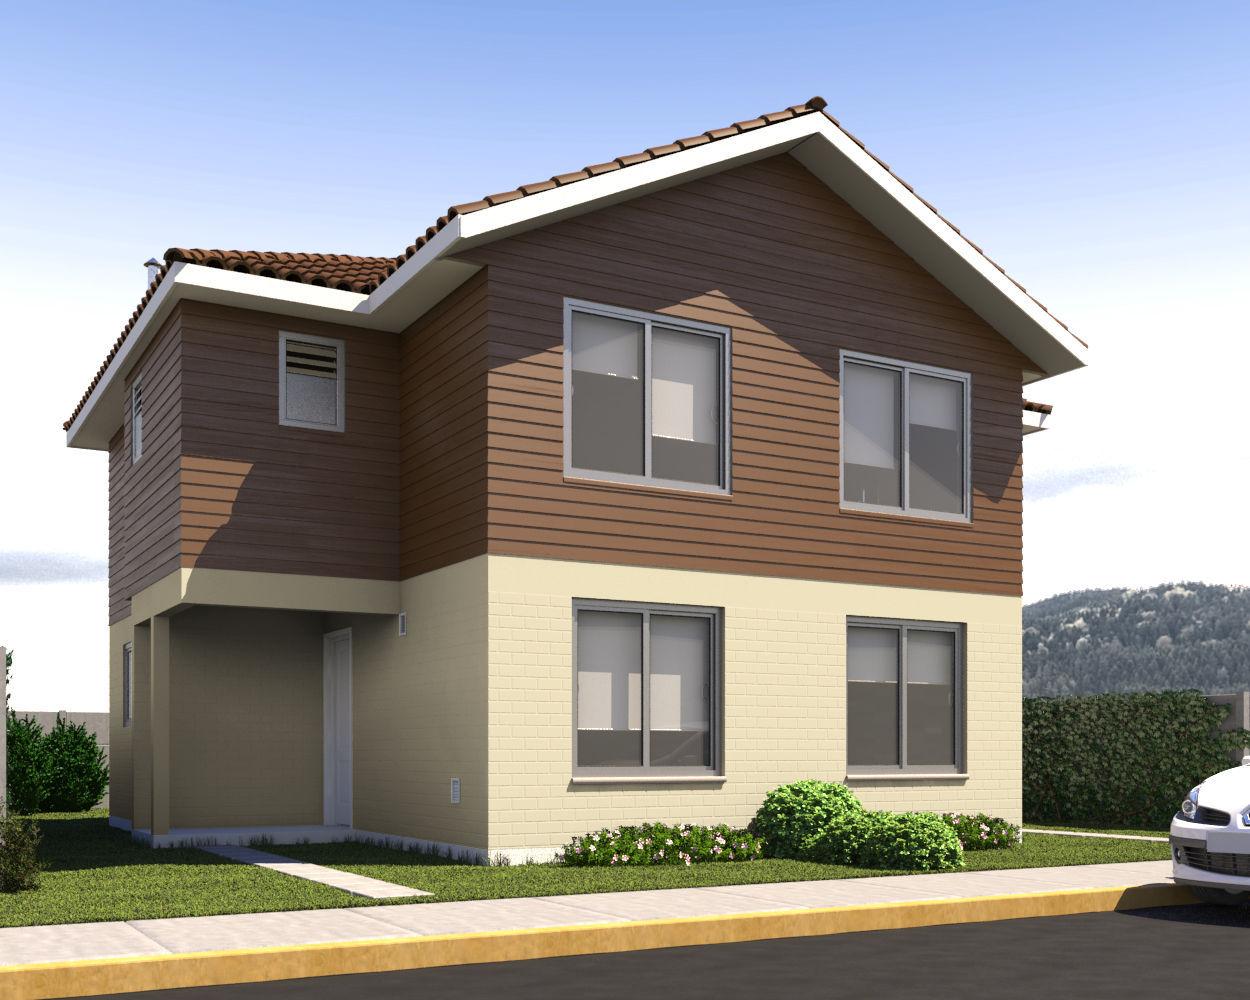 Haz tu propia casa perfect diy haz tu propia estantera - Haz tu propia casa ...